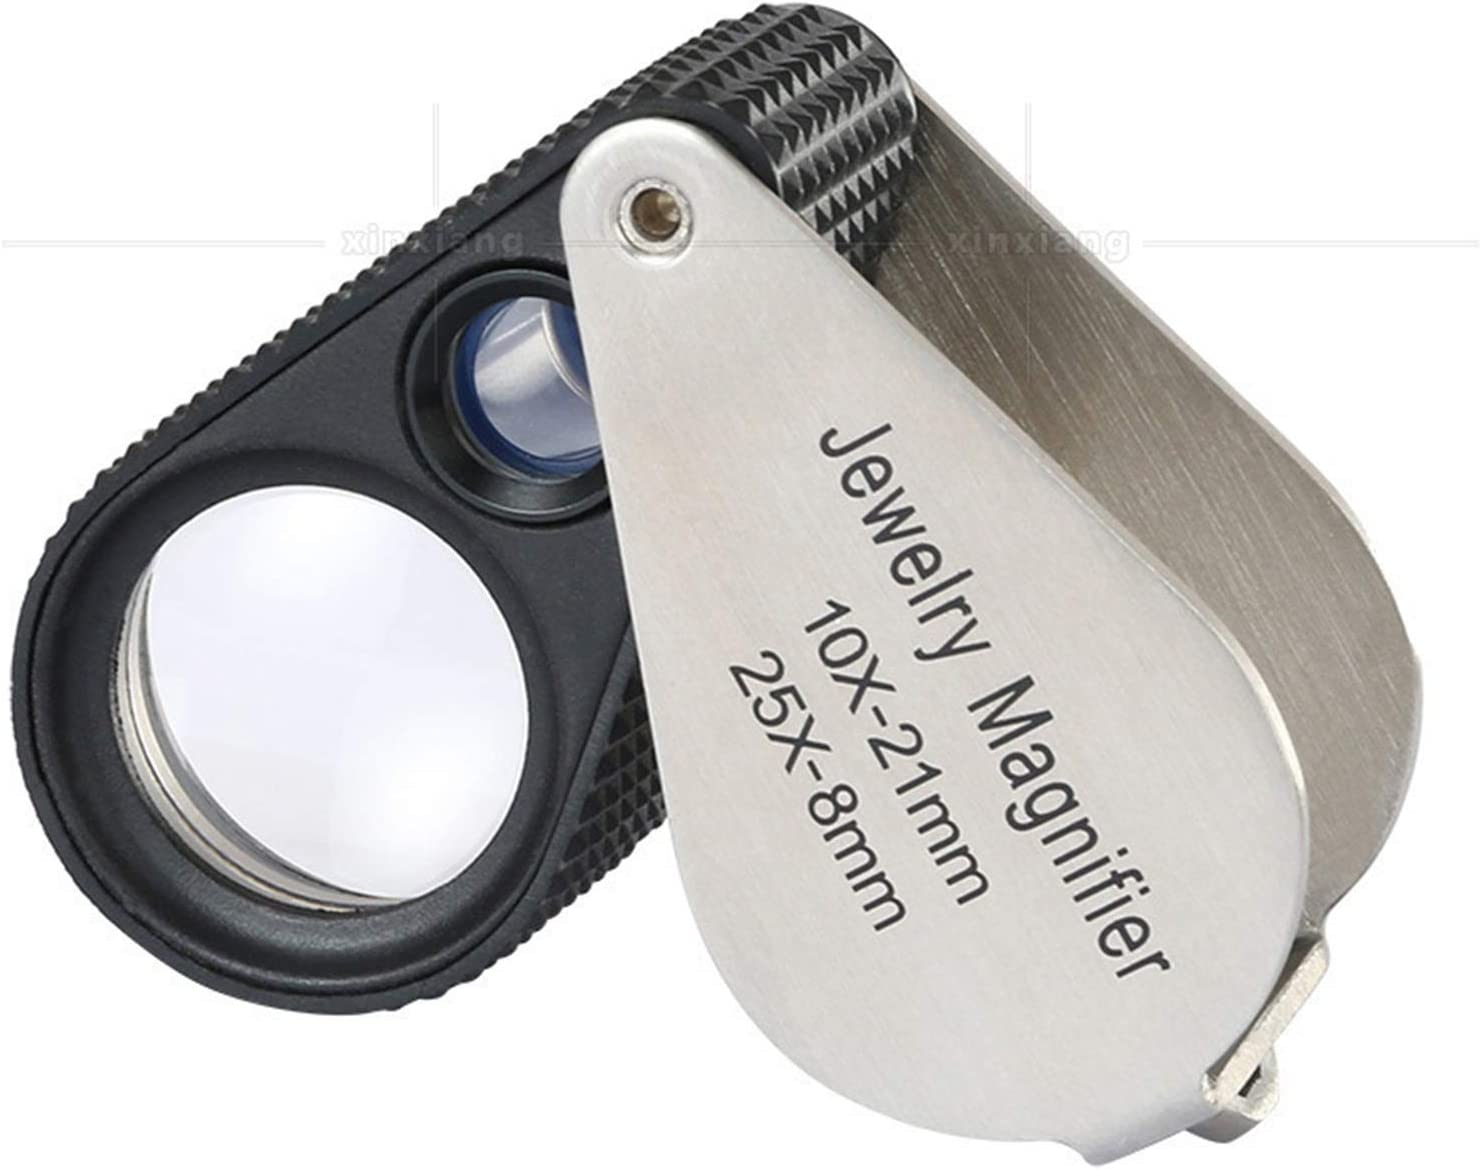 HyiFMY Loupe with Light Limited time cheap sale Handheld Magnifier Jewelry Binocula Free shipping New 10X